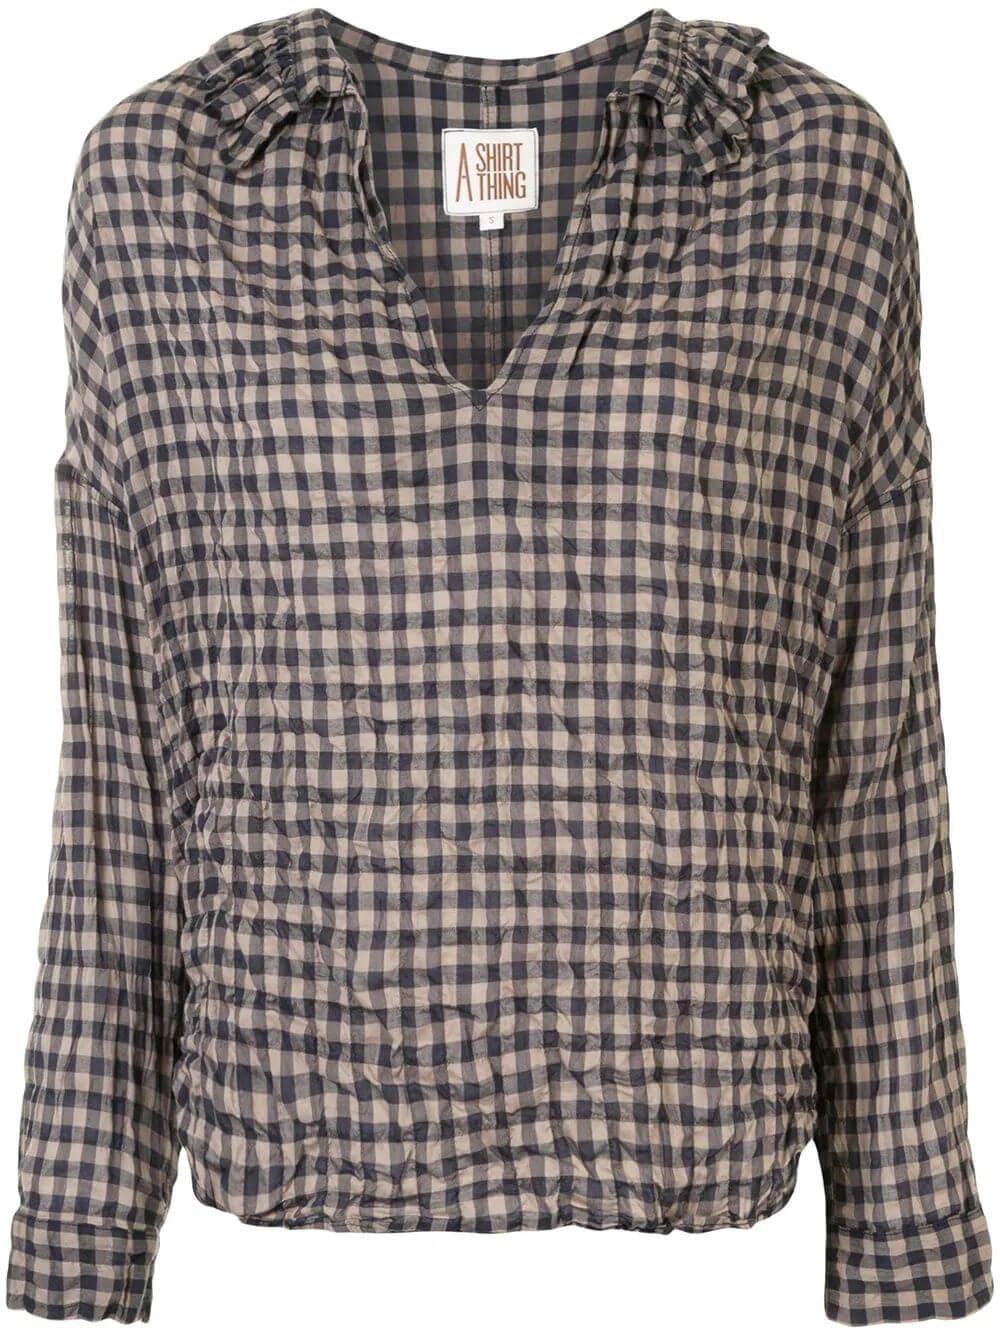 Penelope Gingham Shirt Item # 706-JS35424